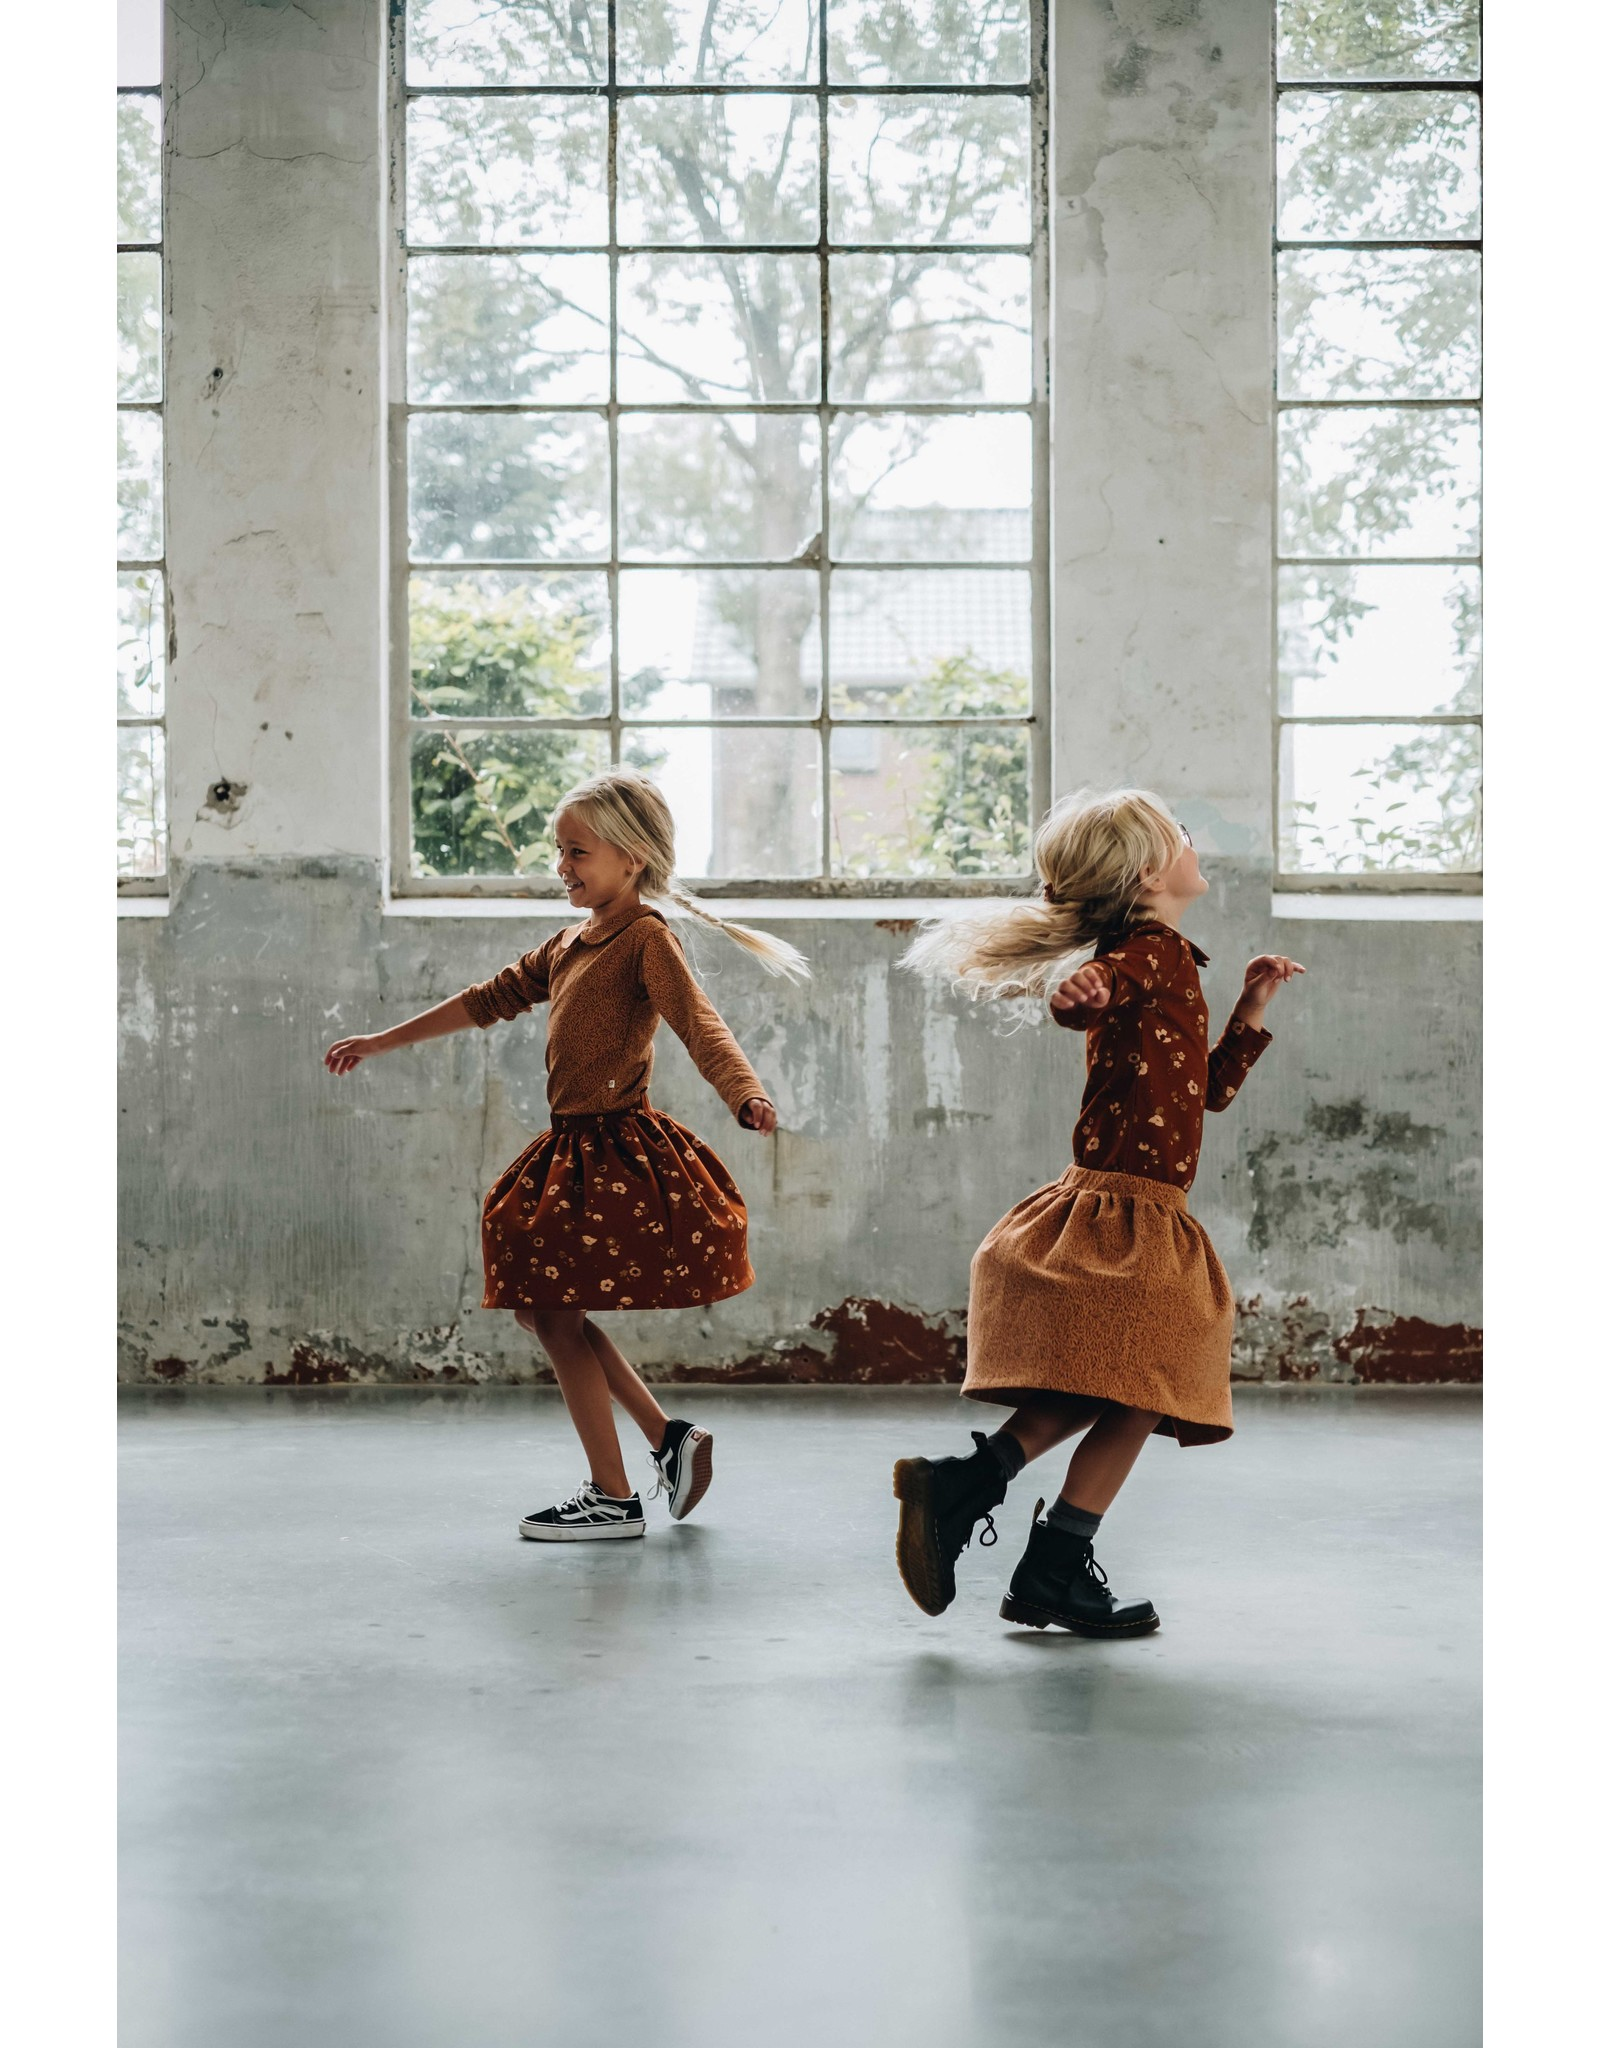 Blossom Kids Skirt Leave Drops - Caramel Fudge